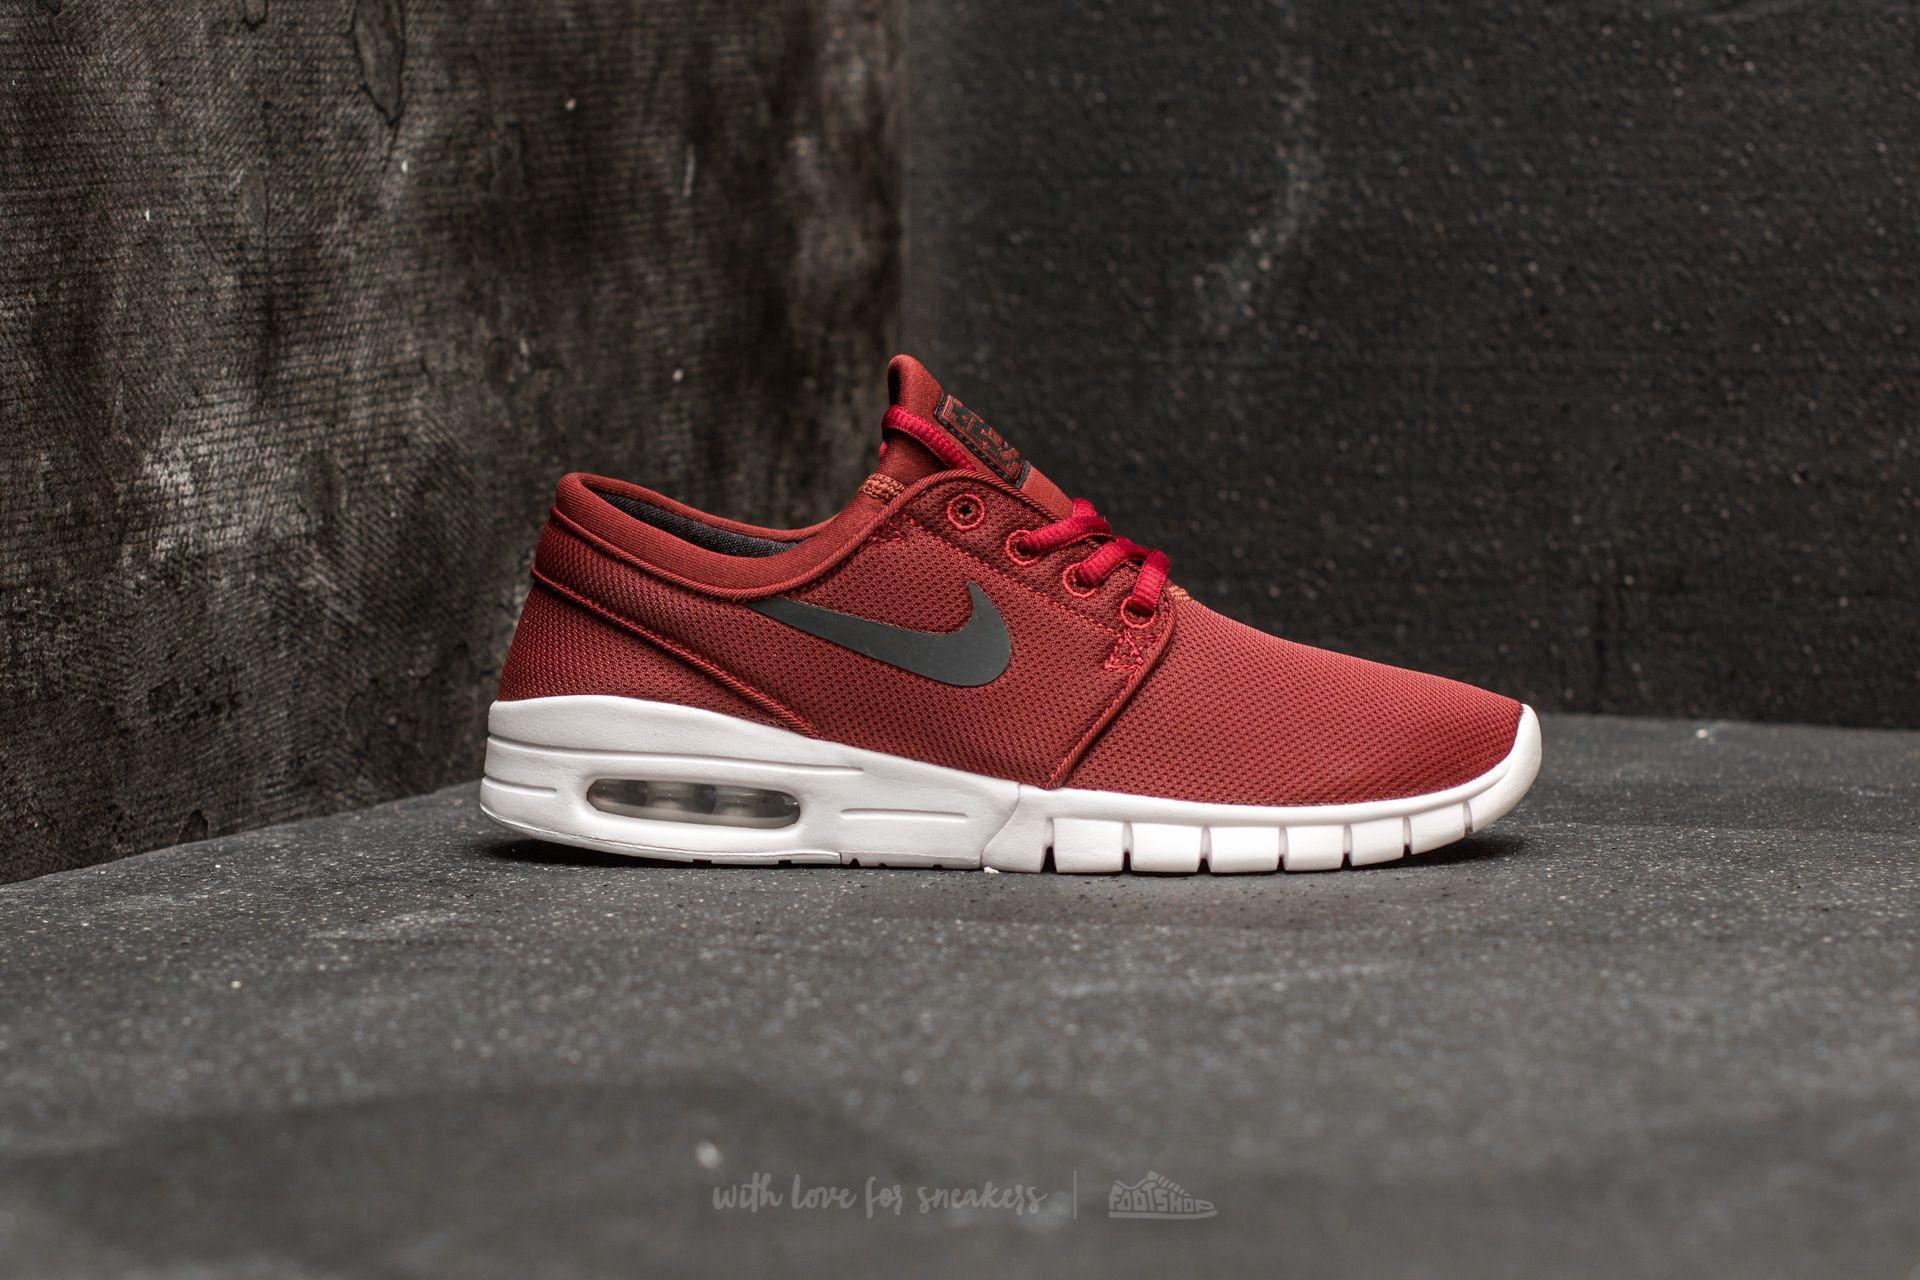 0ac2eba2a738 Lyst - Nike Stefan Janoski Max (gs) Dark Team Red  Black-white in Red